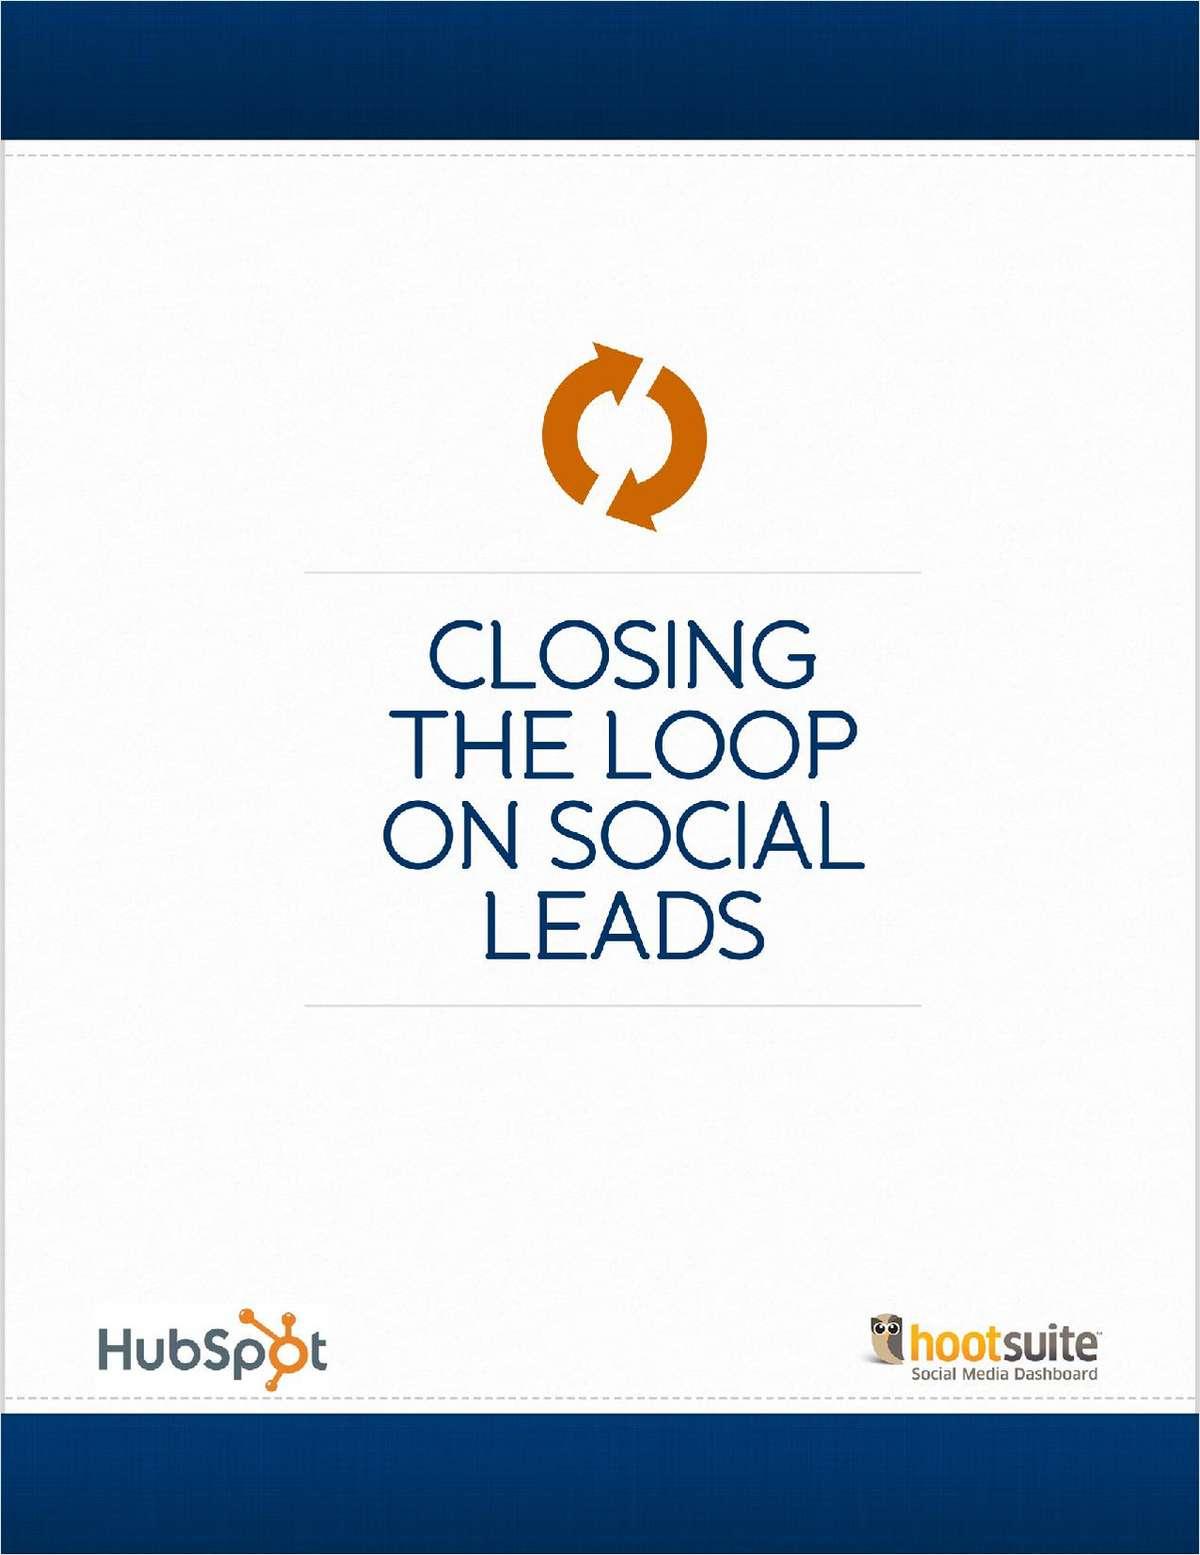 Closing the Loop on Social Leads